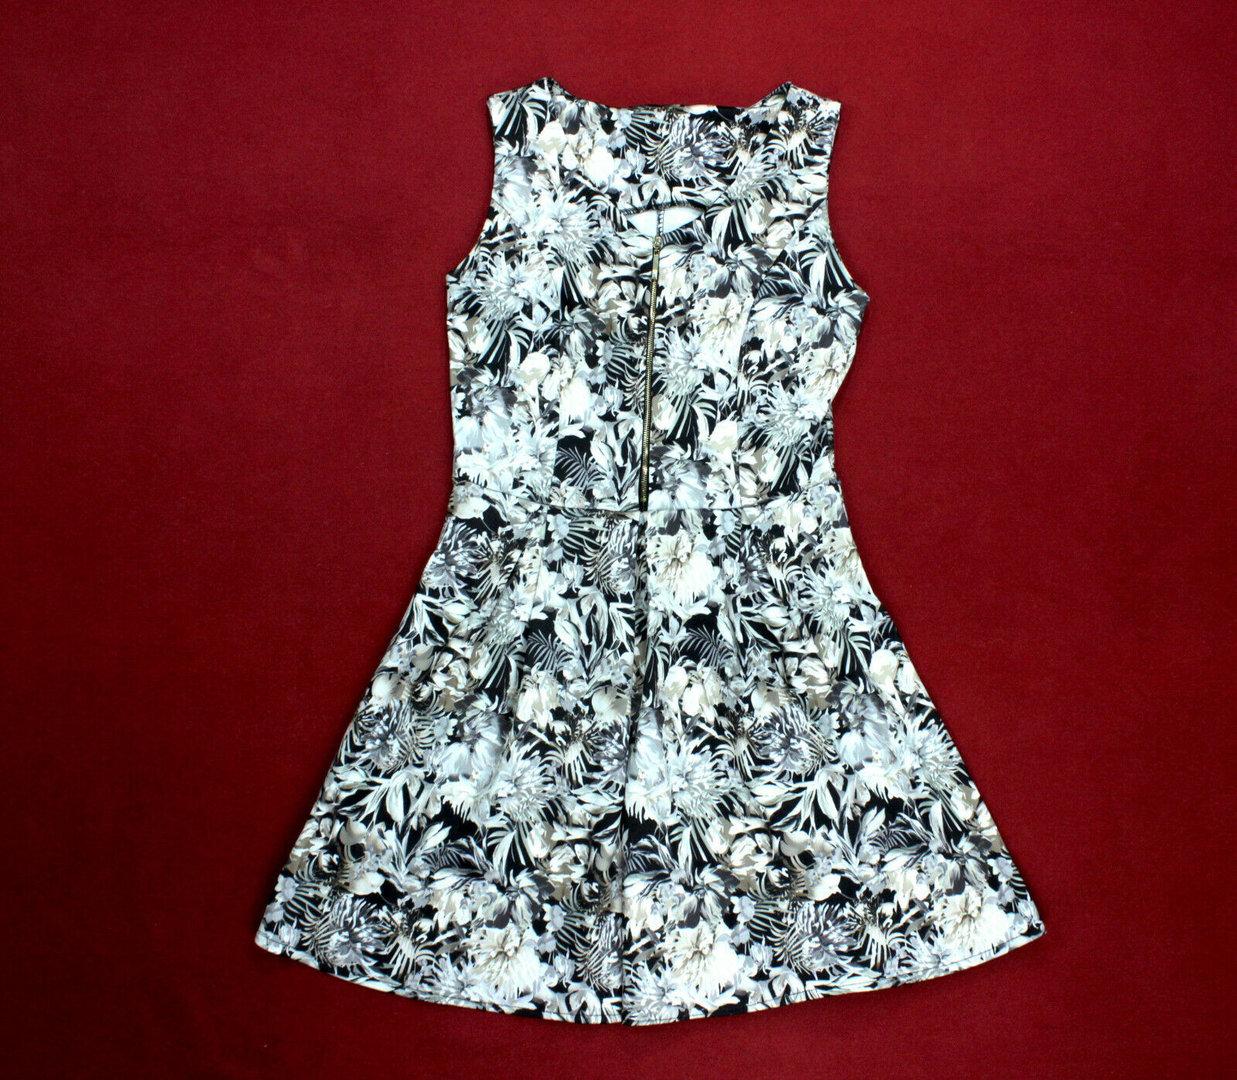 Mini Kleid Damen A Linie Blumen Stretch Ohne Arm 40 Wolkengang De